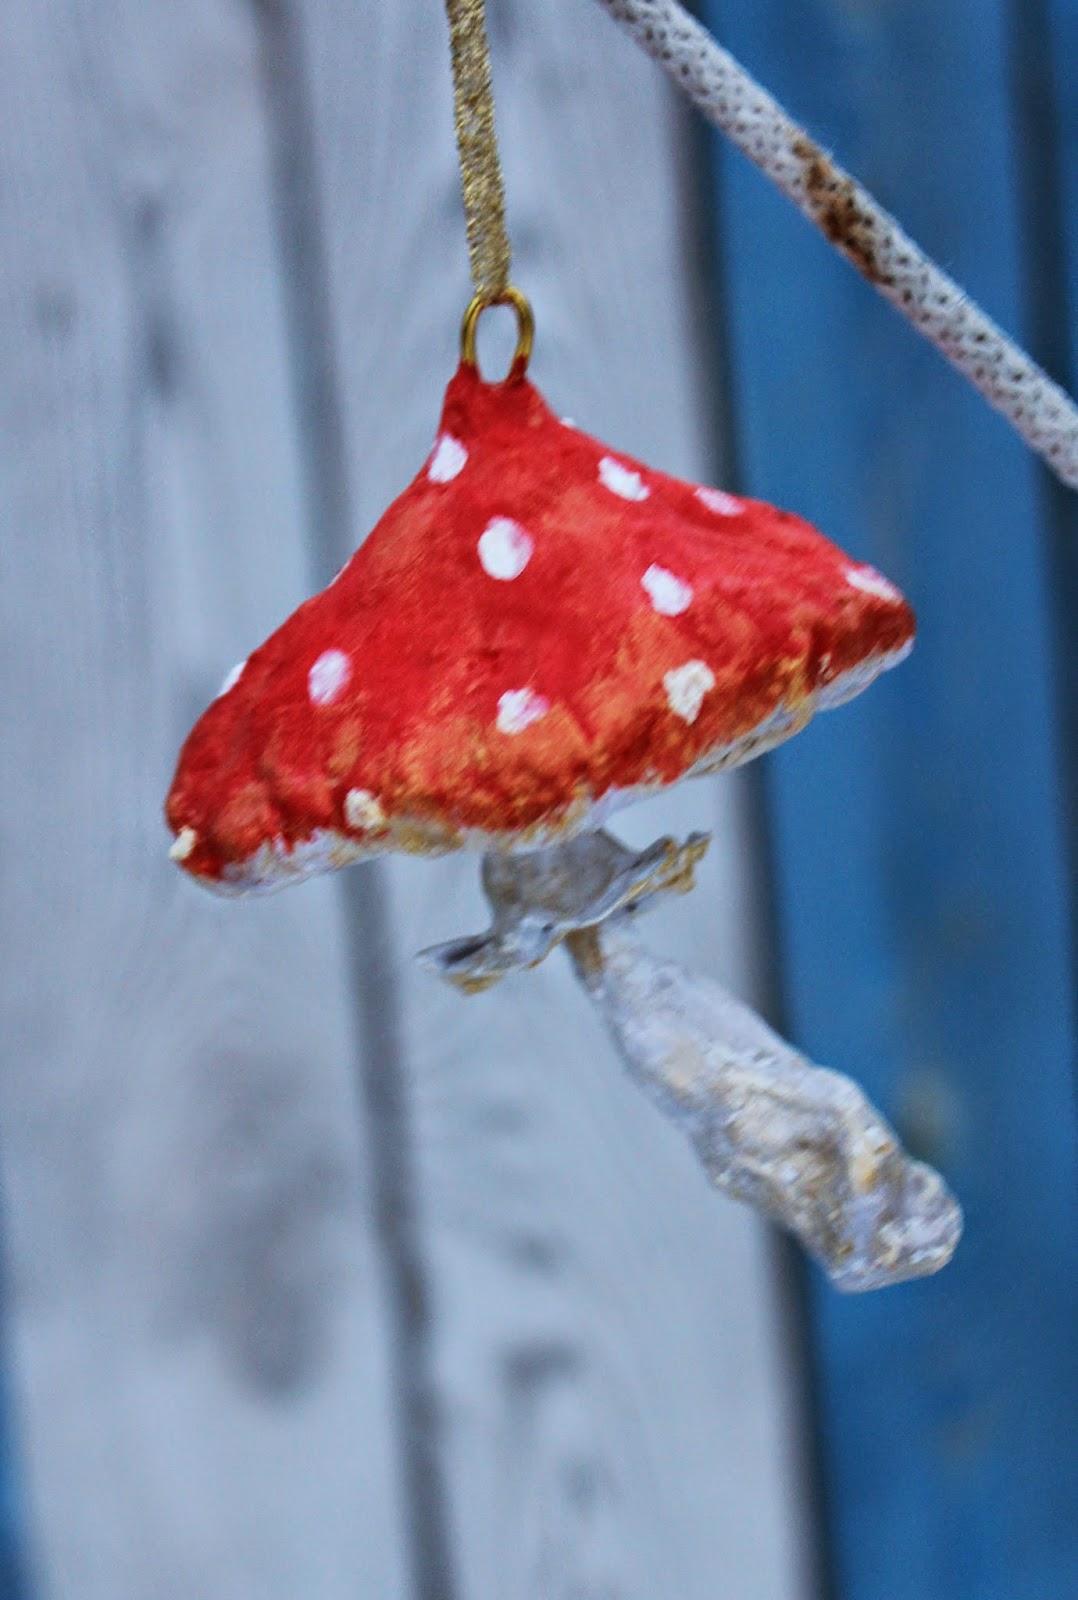 грибок из ватного папье-маше